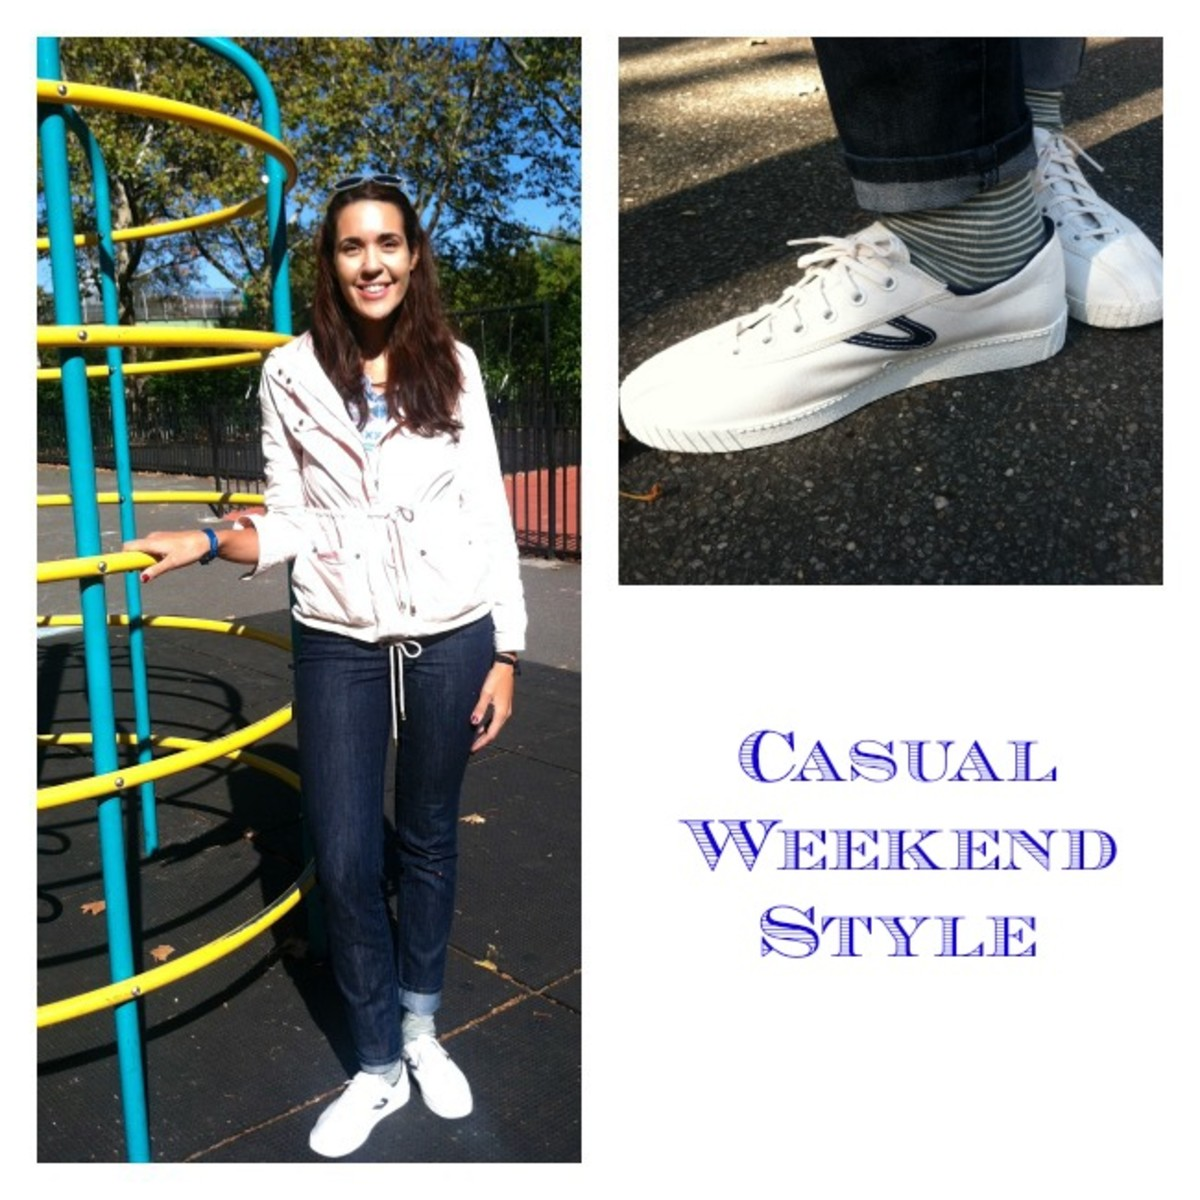 Casual Weekend Style, weekend style